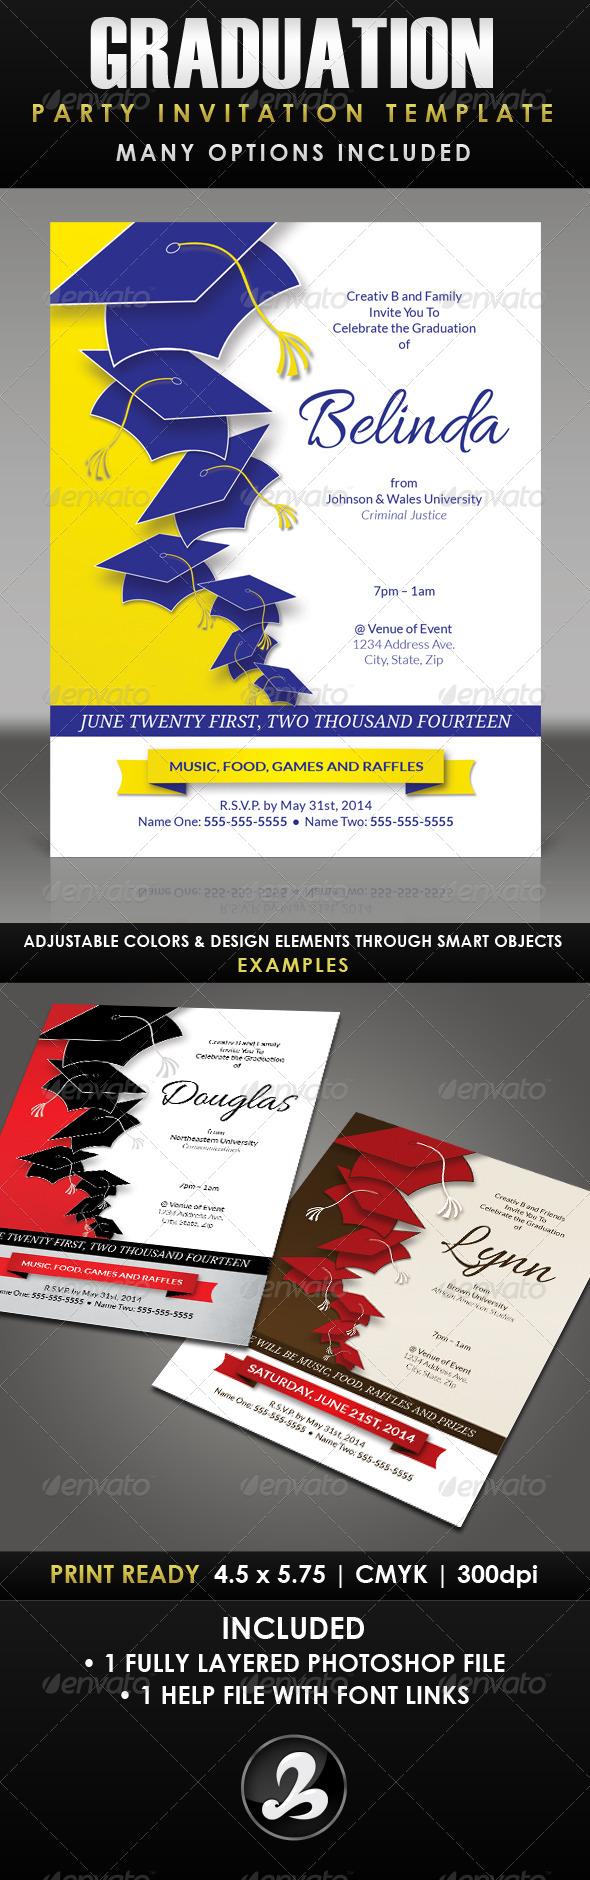 Graduation Party Invitation Template - 1 - Invitations Cards & Invites